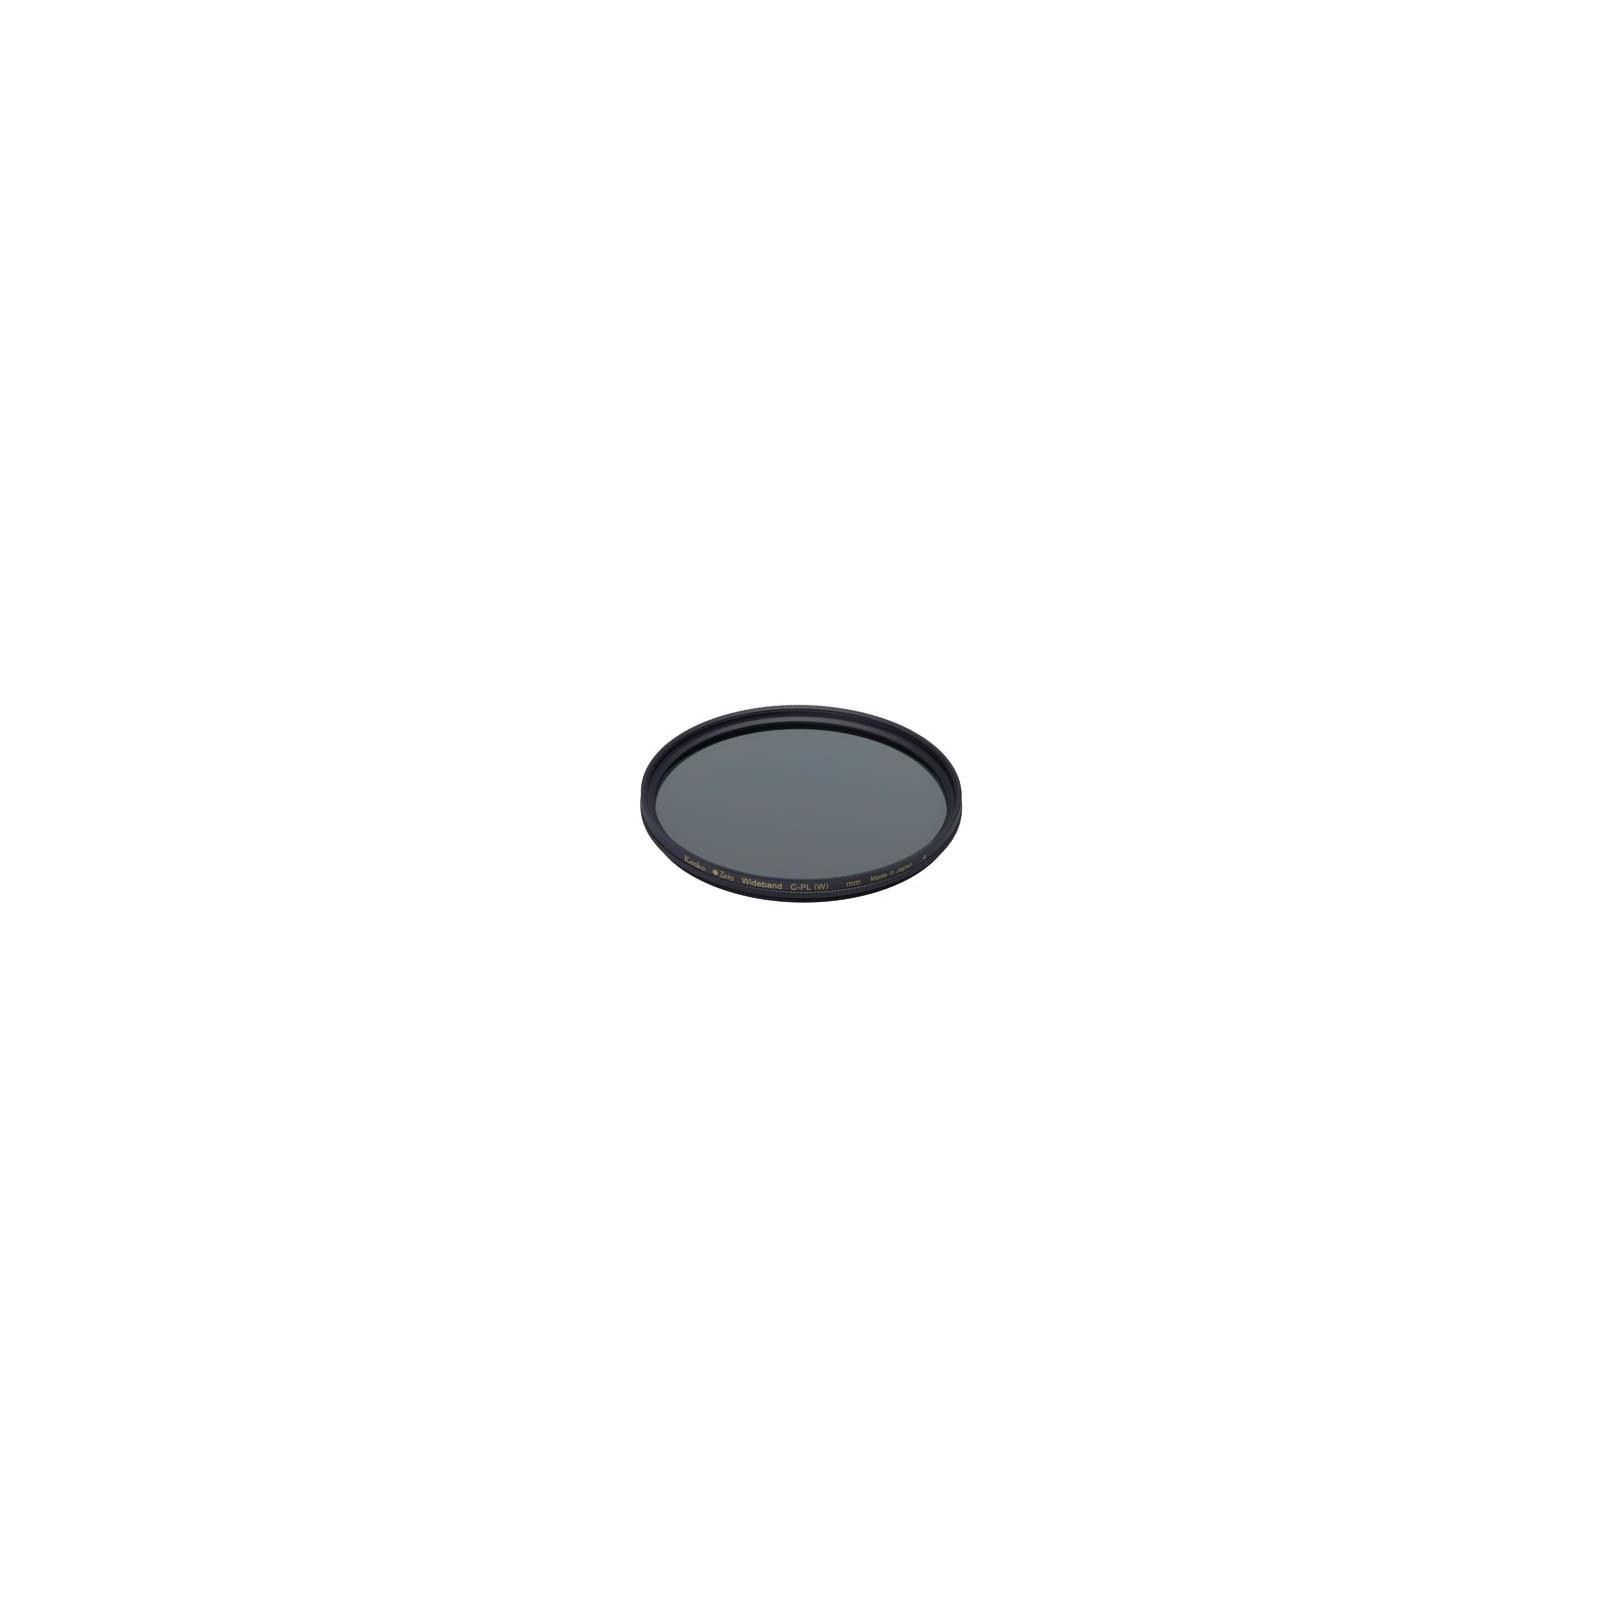 Светофильтр Kenko E-CPL 58mm (38347)